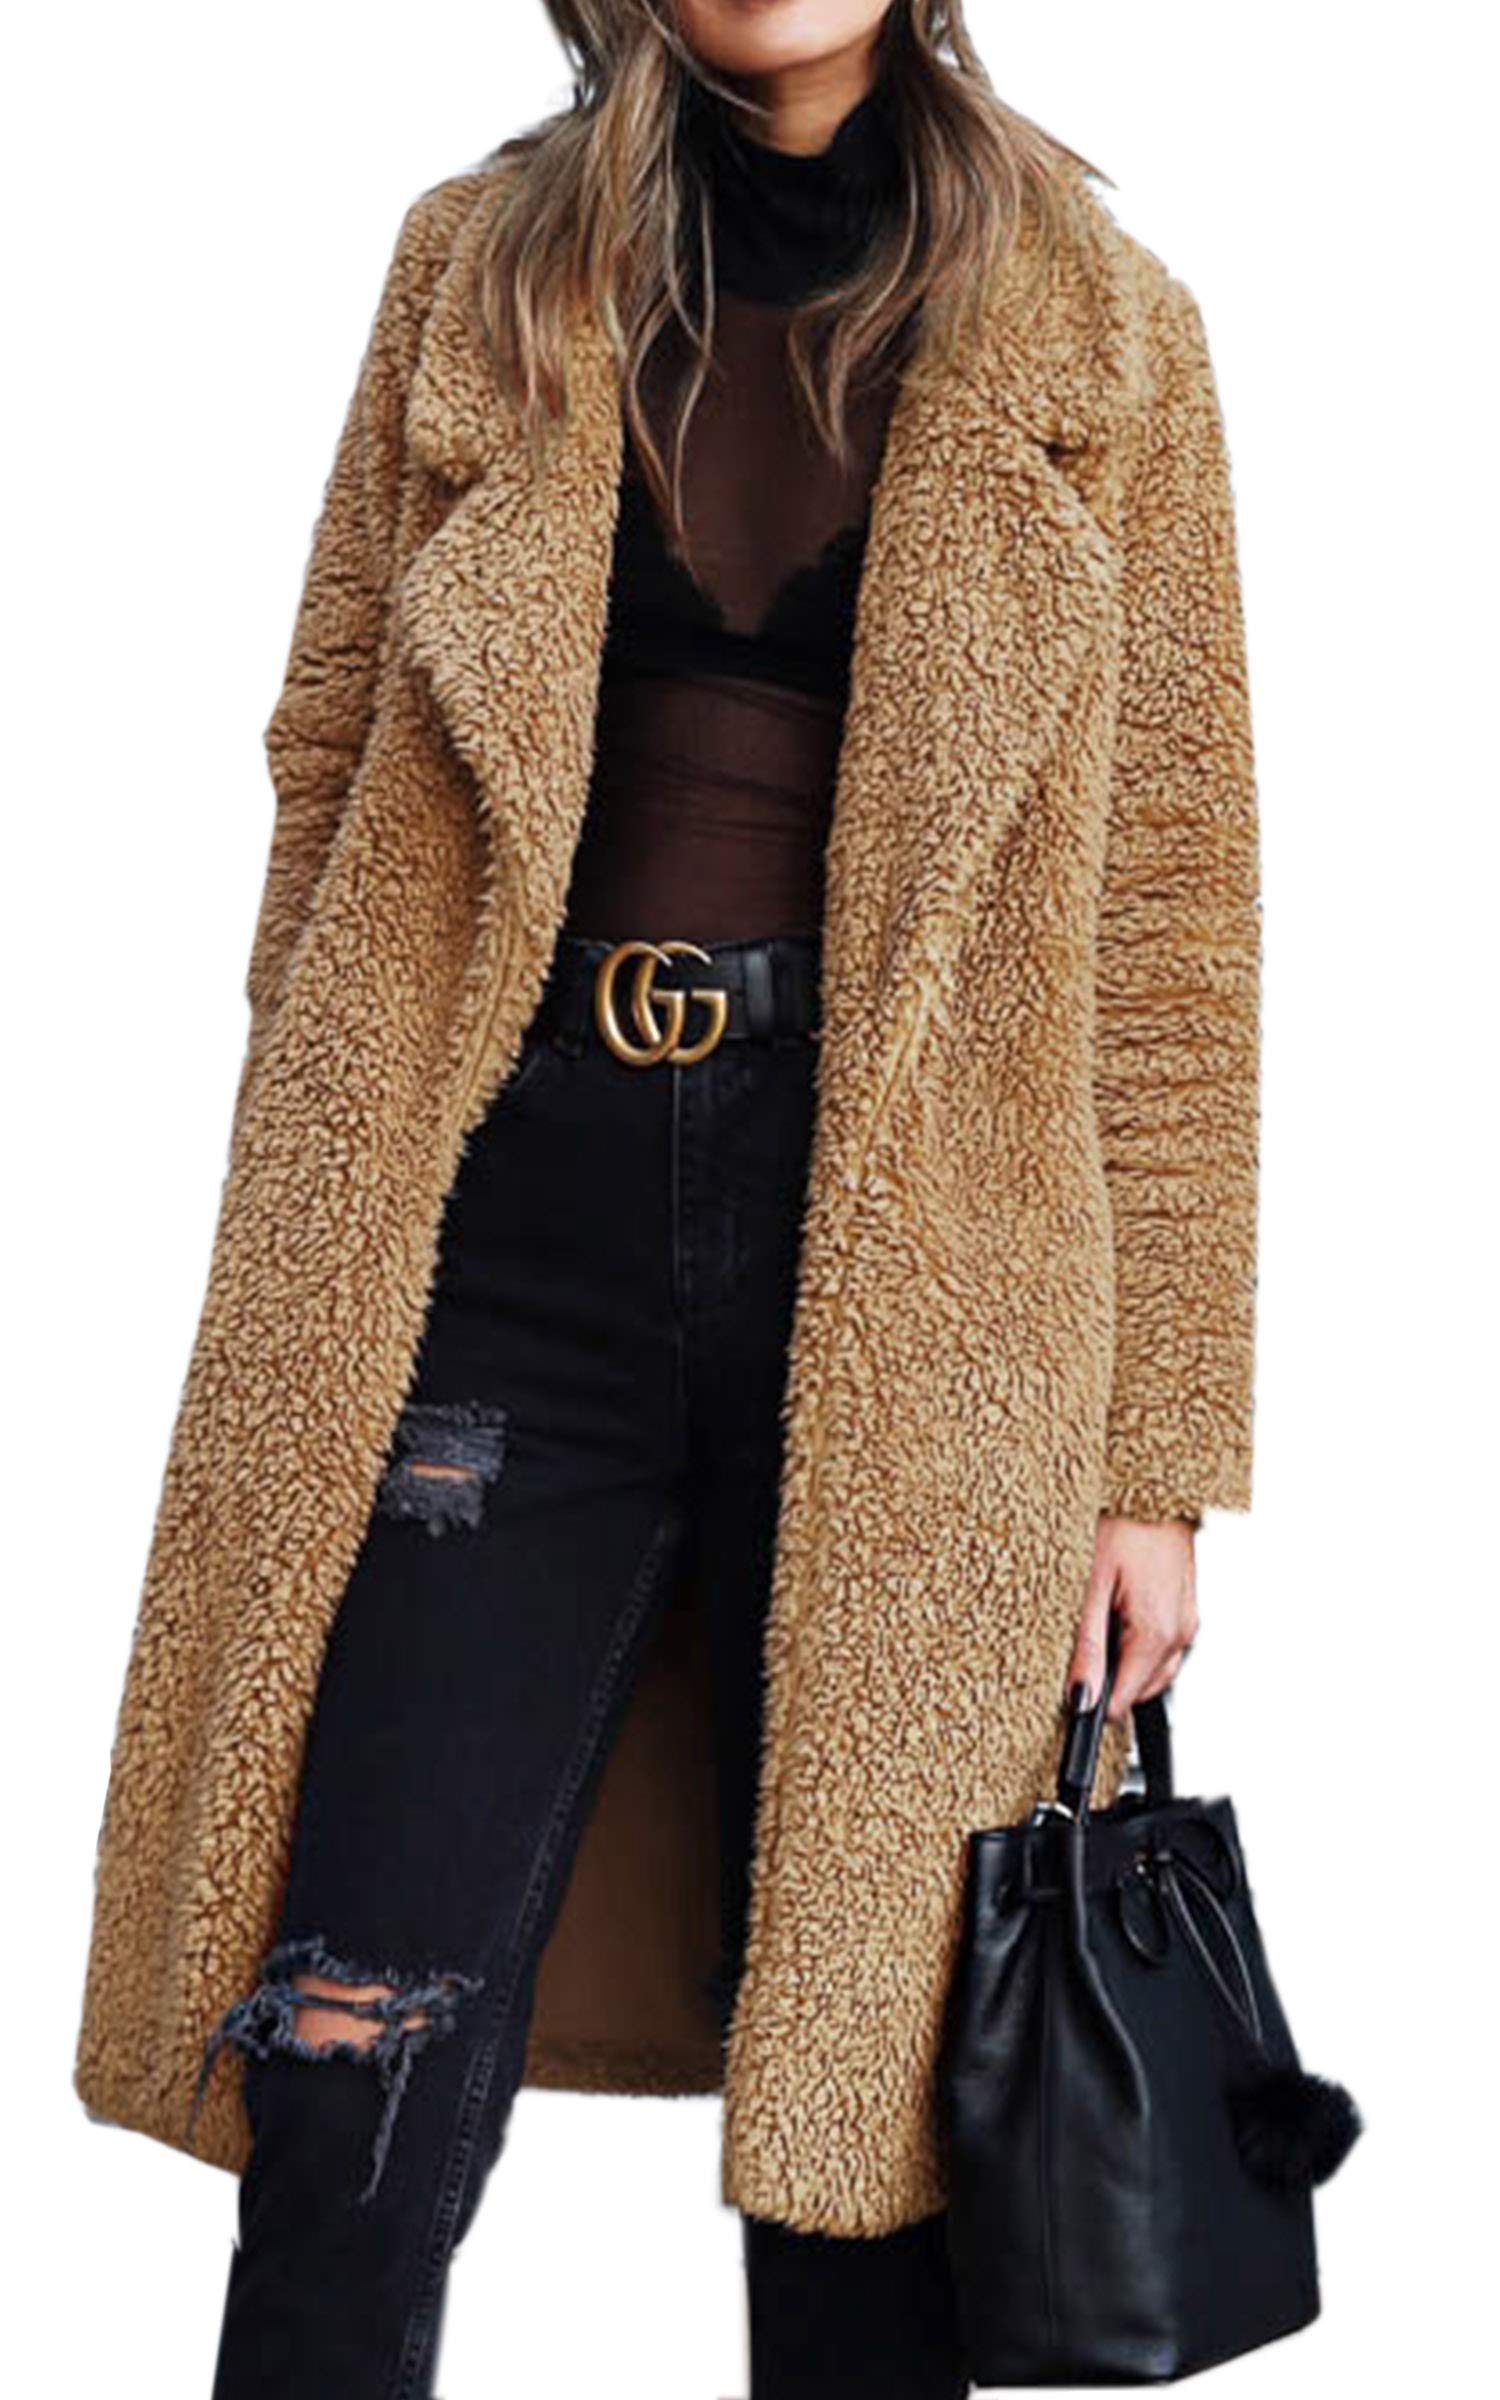 Angashion Women's Fuzzy Fleece Lapel Open Front Long Cardigan Coat Faux Fur Warm Winter Outwear Jackets with Pockets Dark Camel S by Angashion